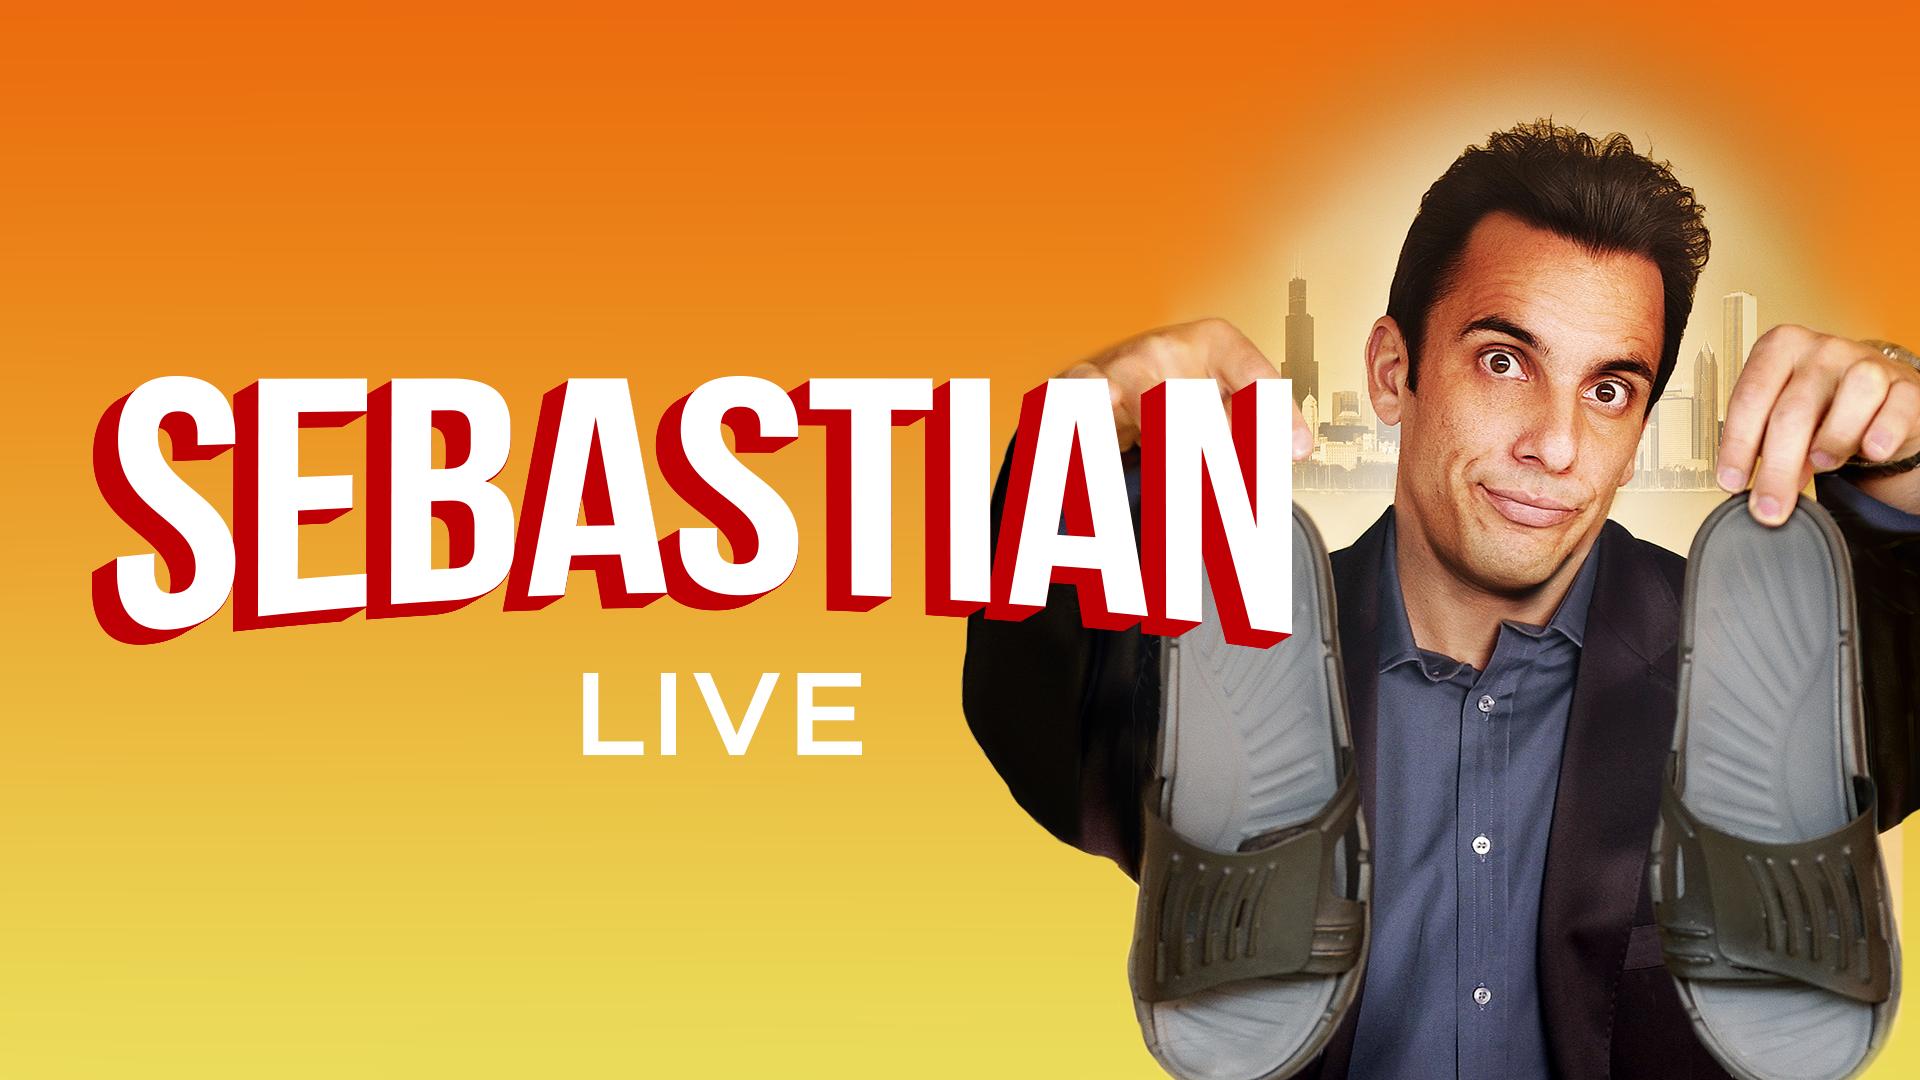 Sebastian LIVE